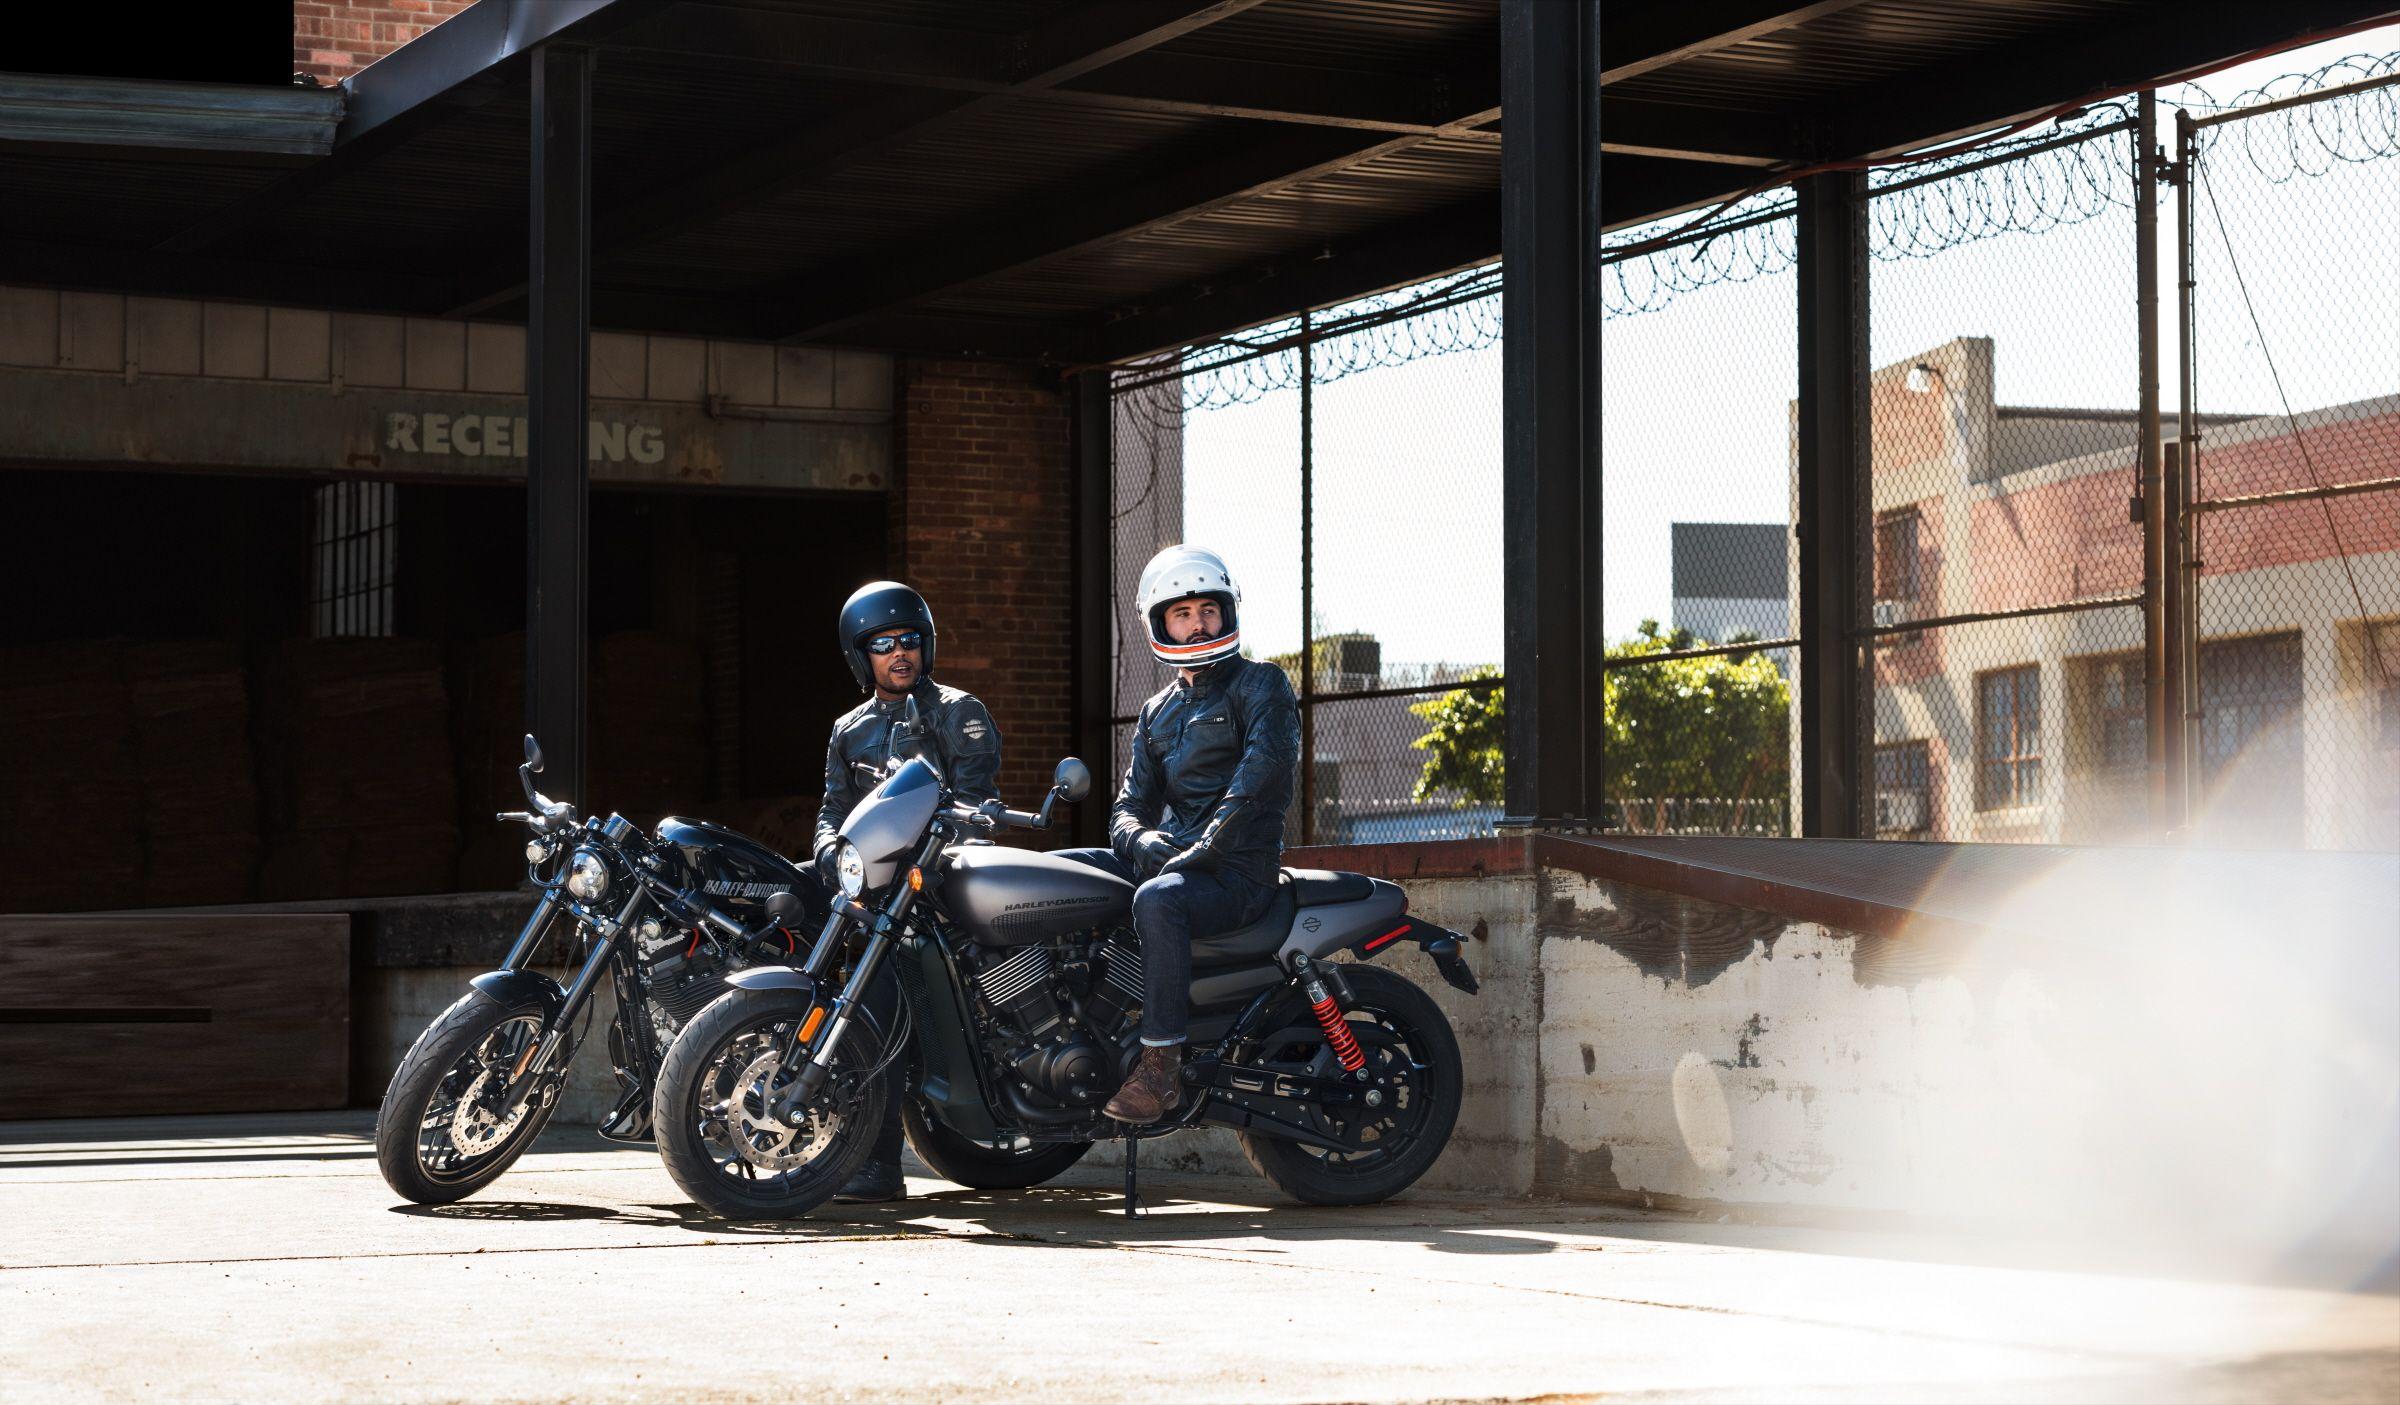 Harley Davidson street rod 2017 #7